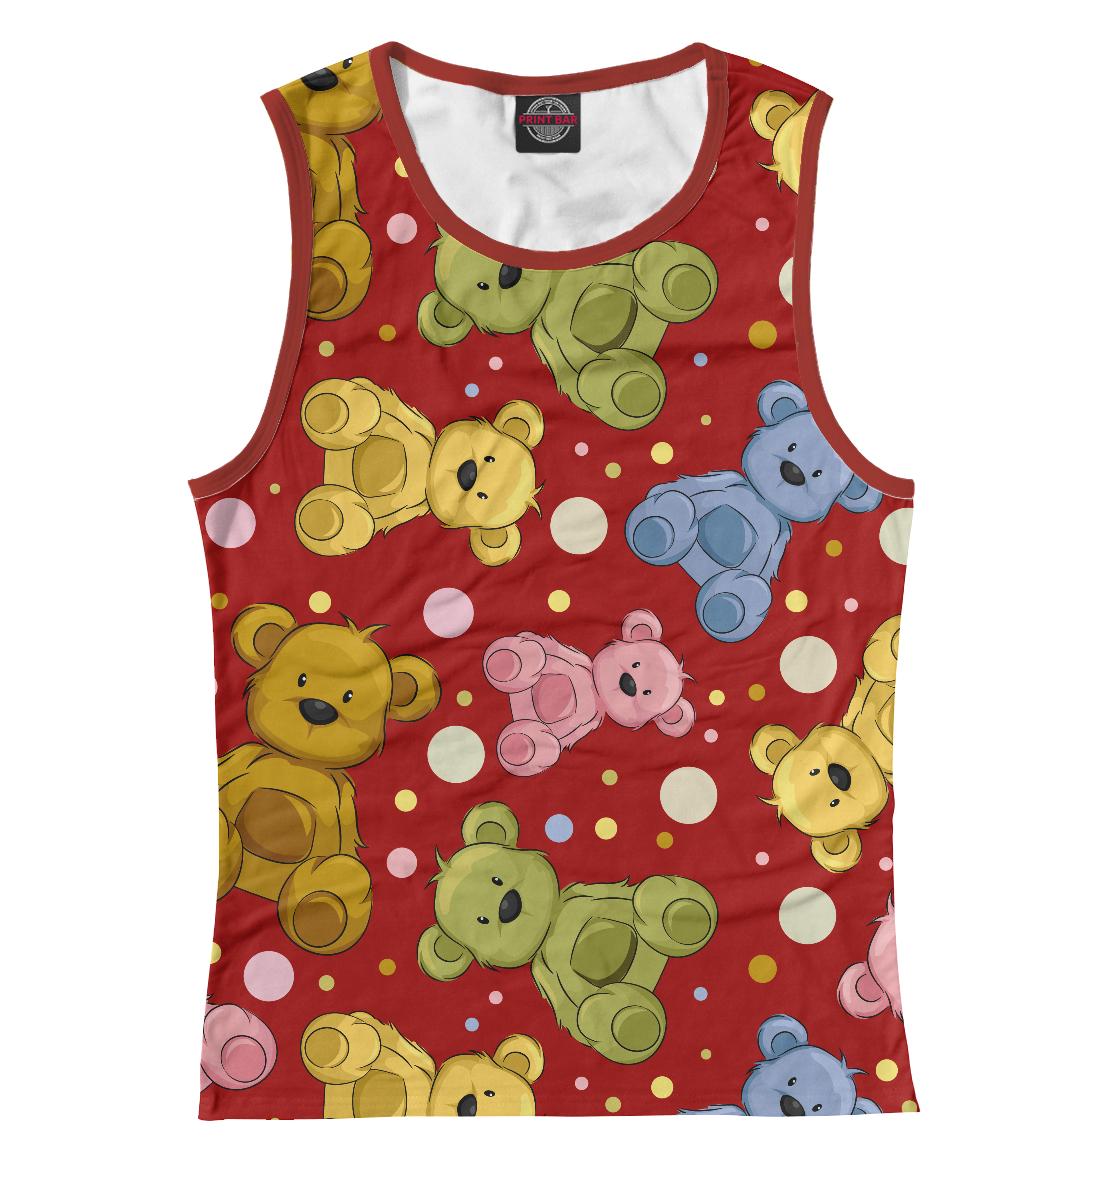 Купить Cute teddy bears, Printbar, Майки, APD-812030-may-1